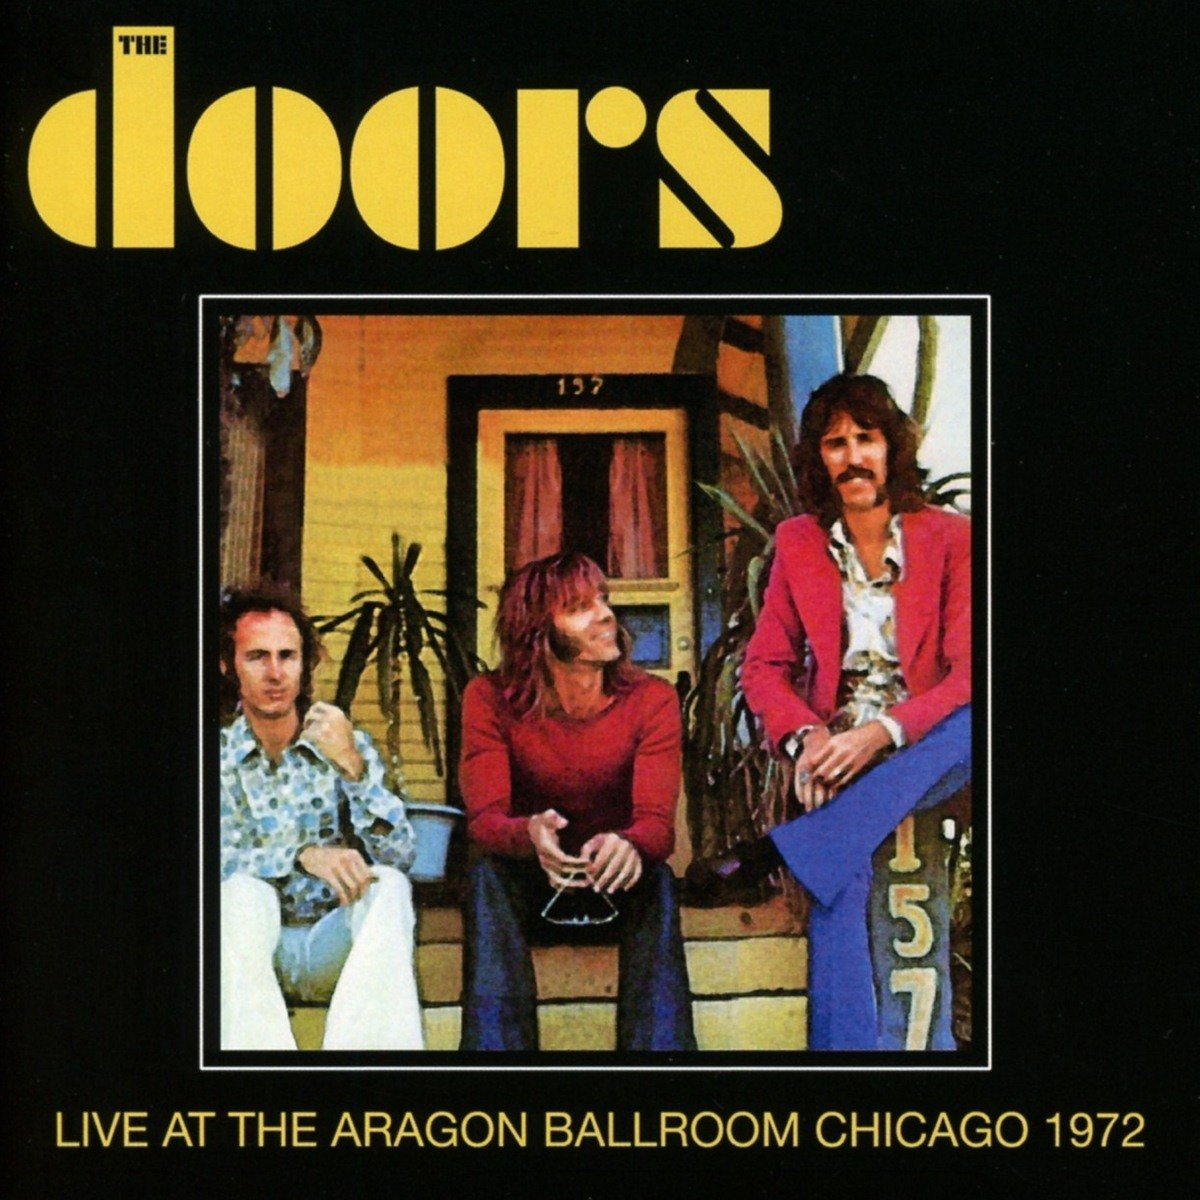 DOORS - Live At The Aragon Ballroom - Chicago 1972